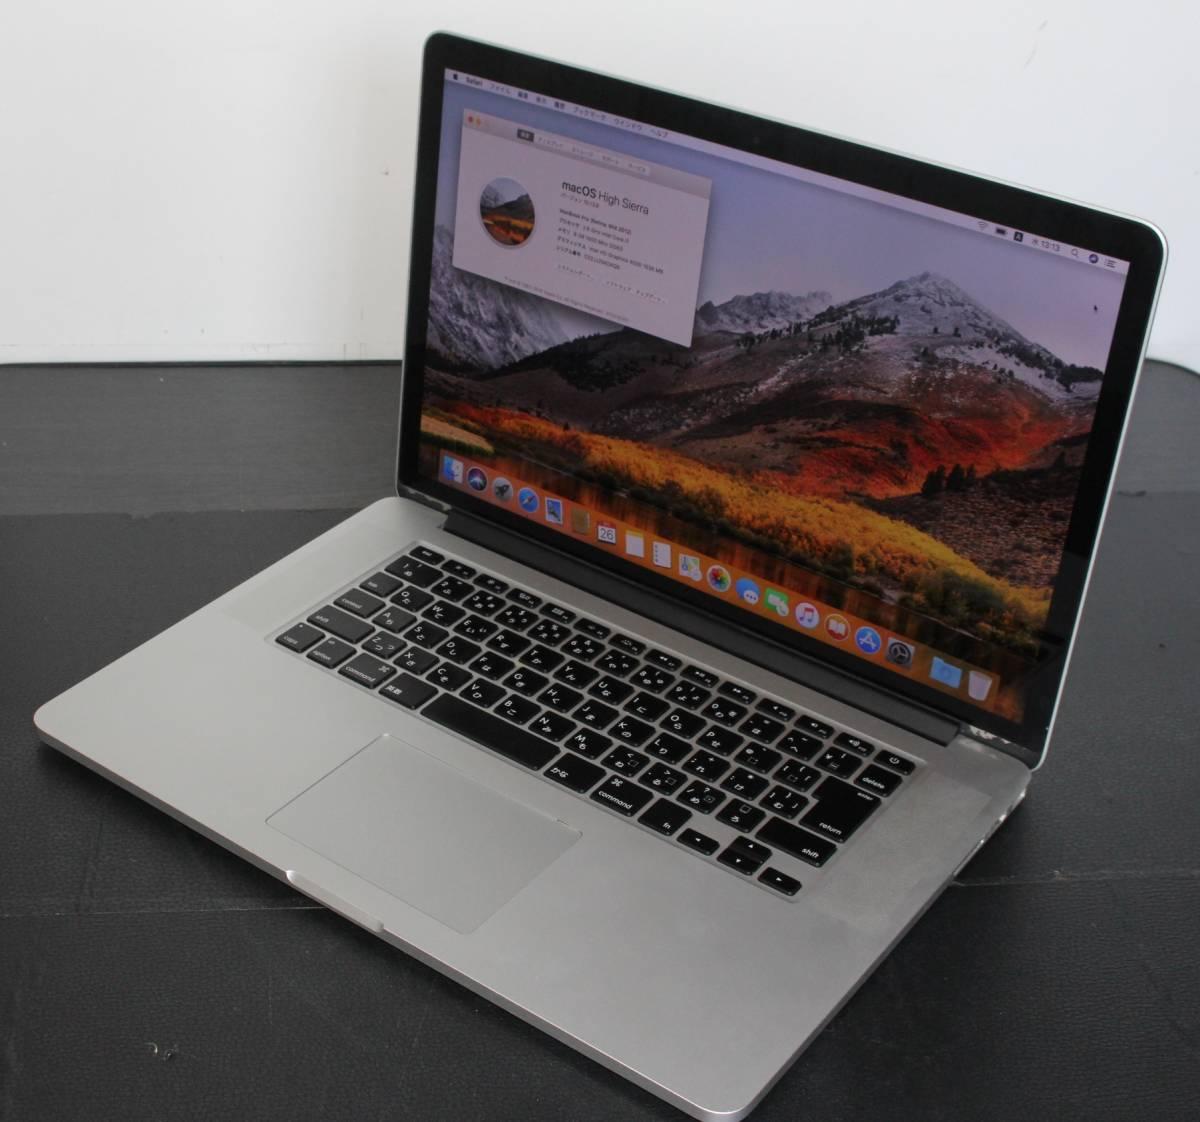 ★MacBook Pro A1398 Core i7 2.60Ghz 8GB SSD 512GB 15.4TFT カメラ★Mid 2012★OS High Sierra★